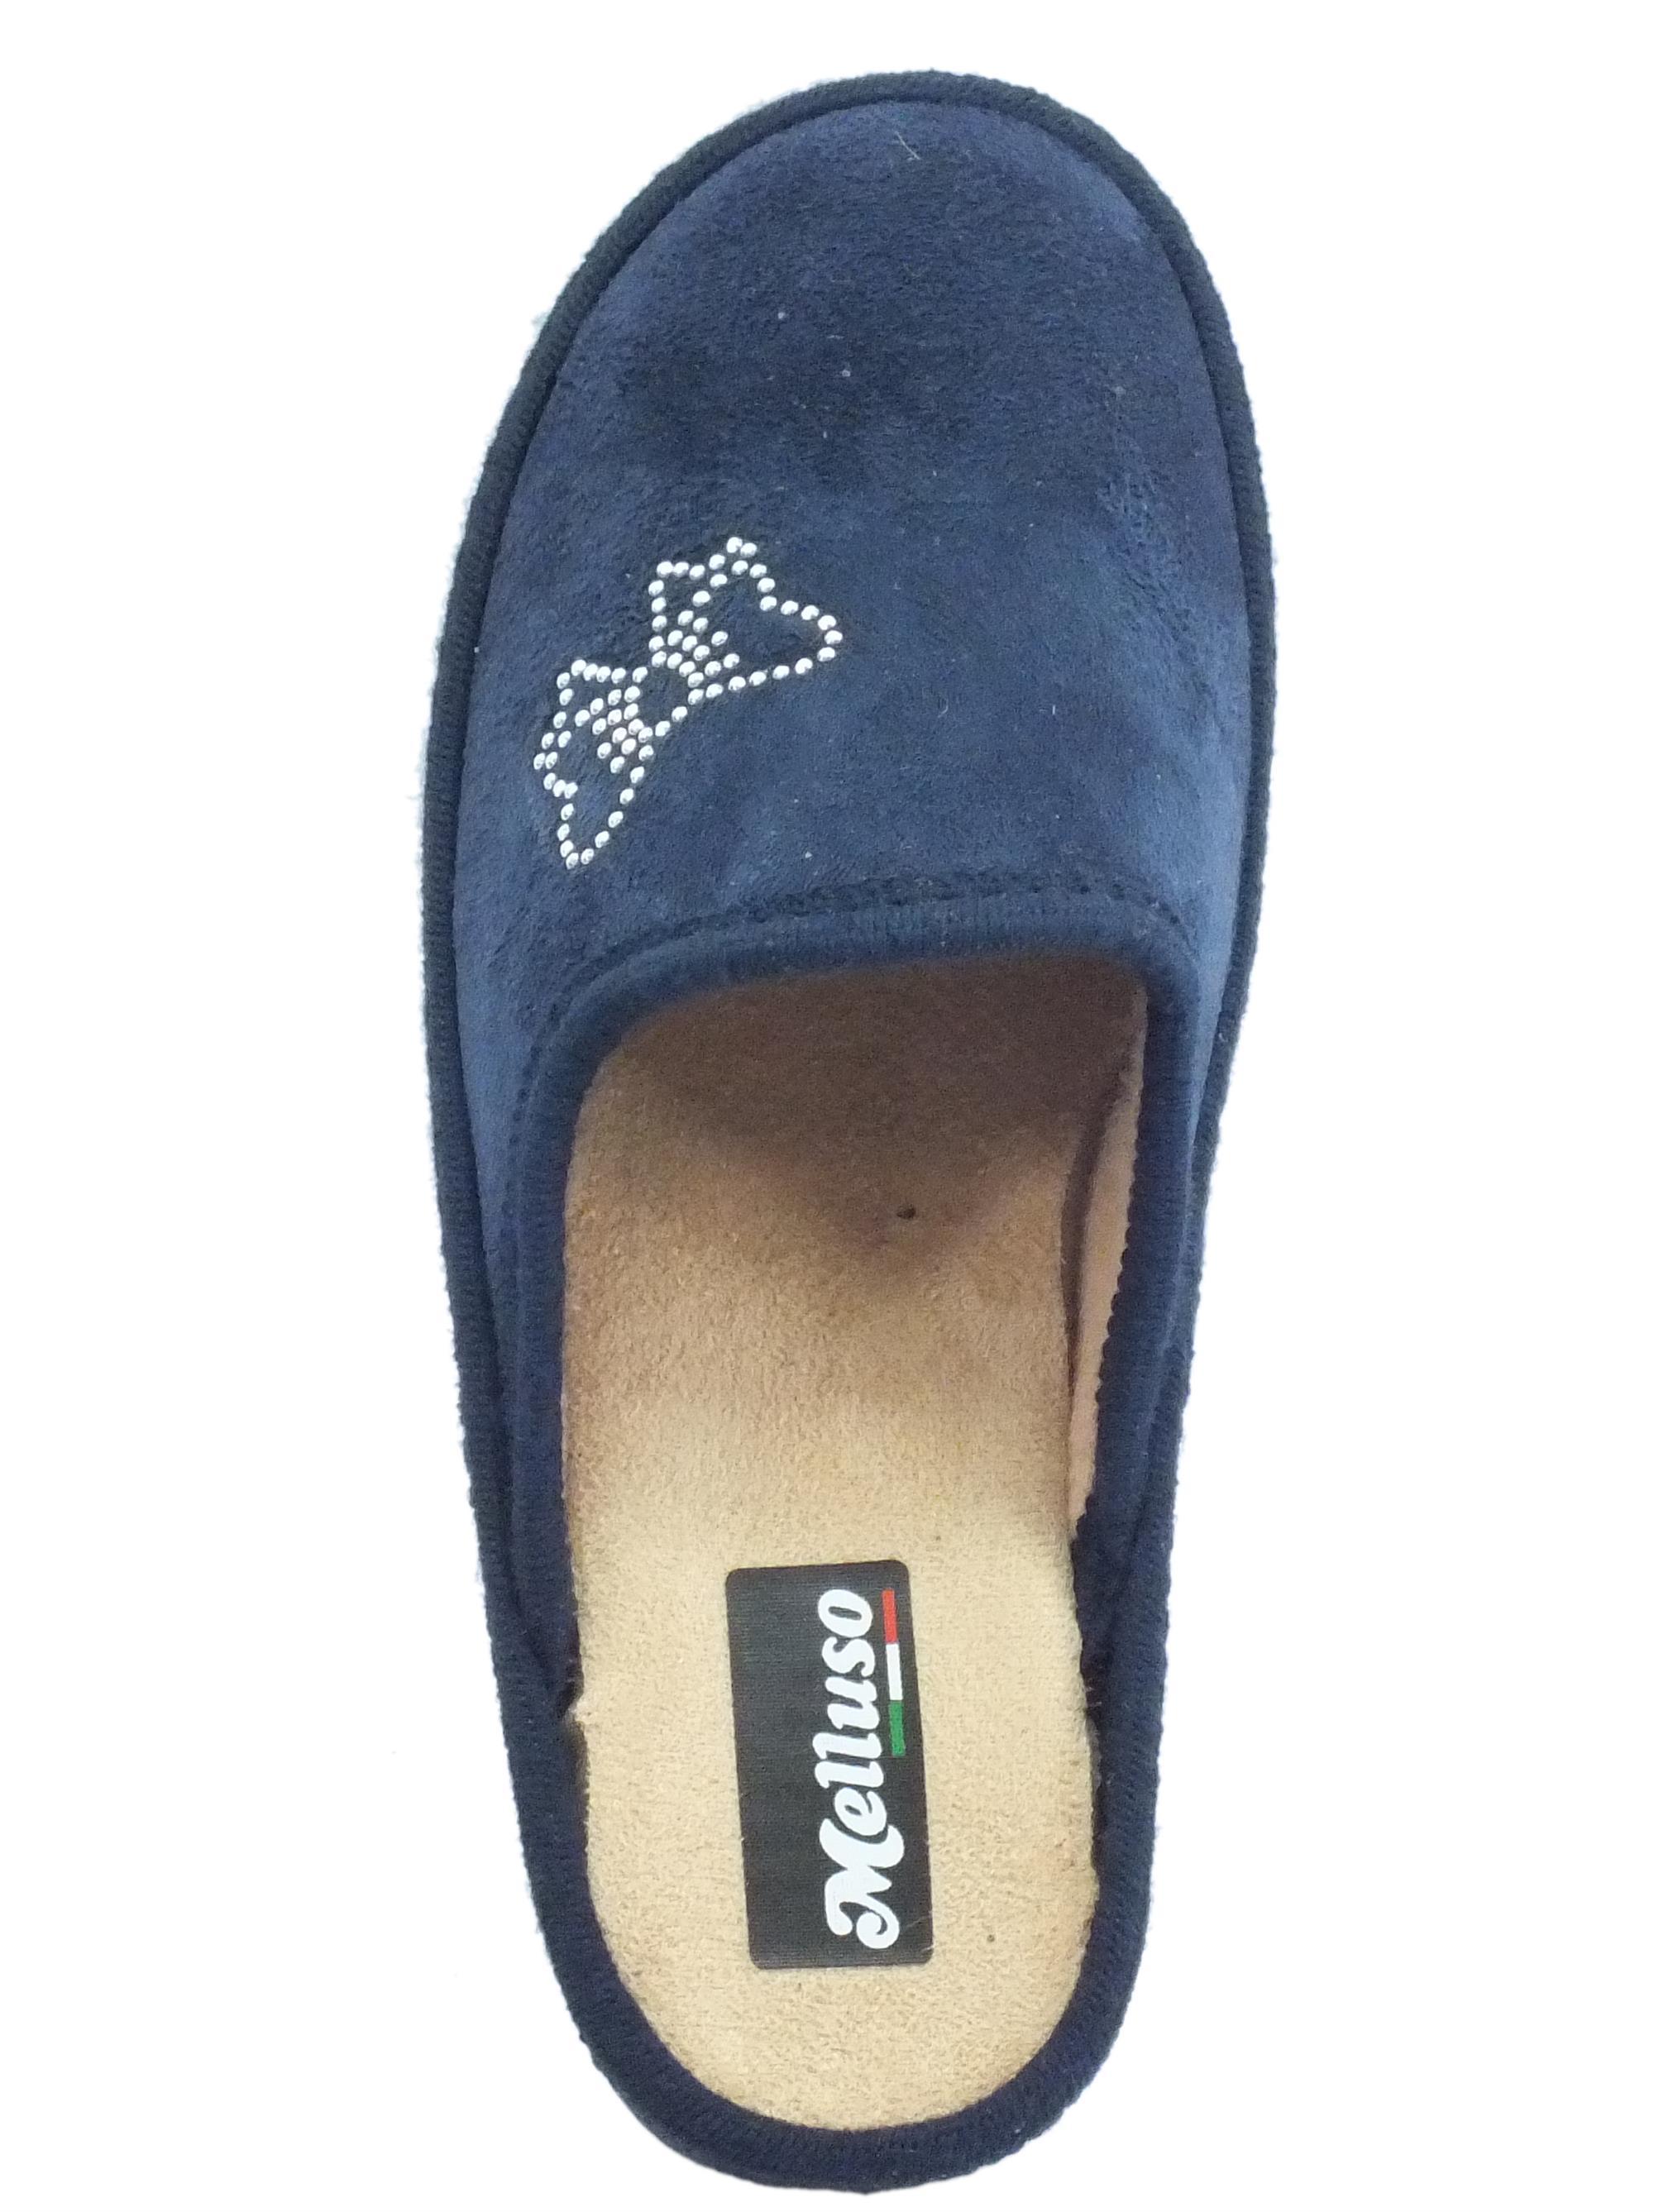 Pantofole Melluso donna tessuto blu beige - Vitiello Calzature 6b571e7d4db